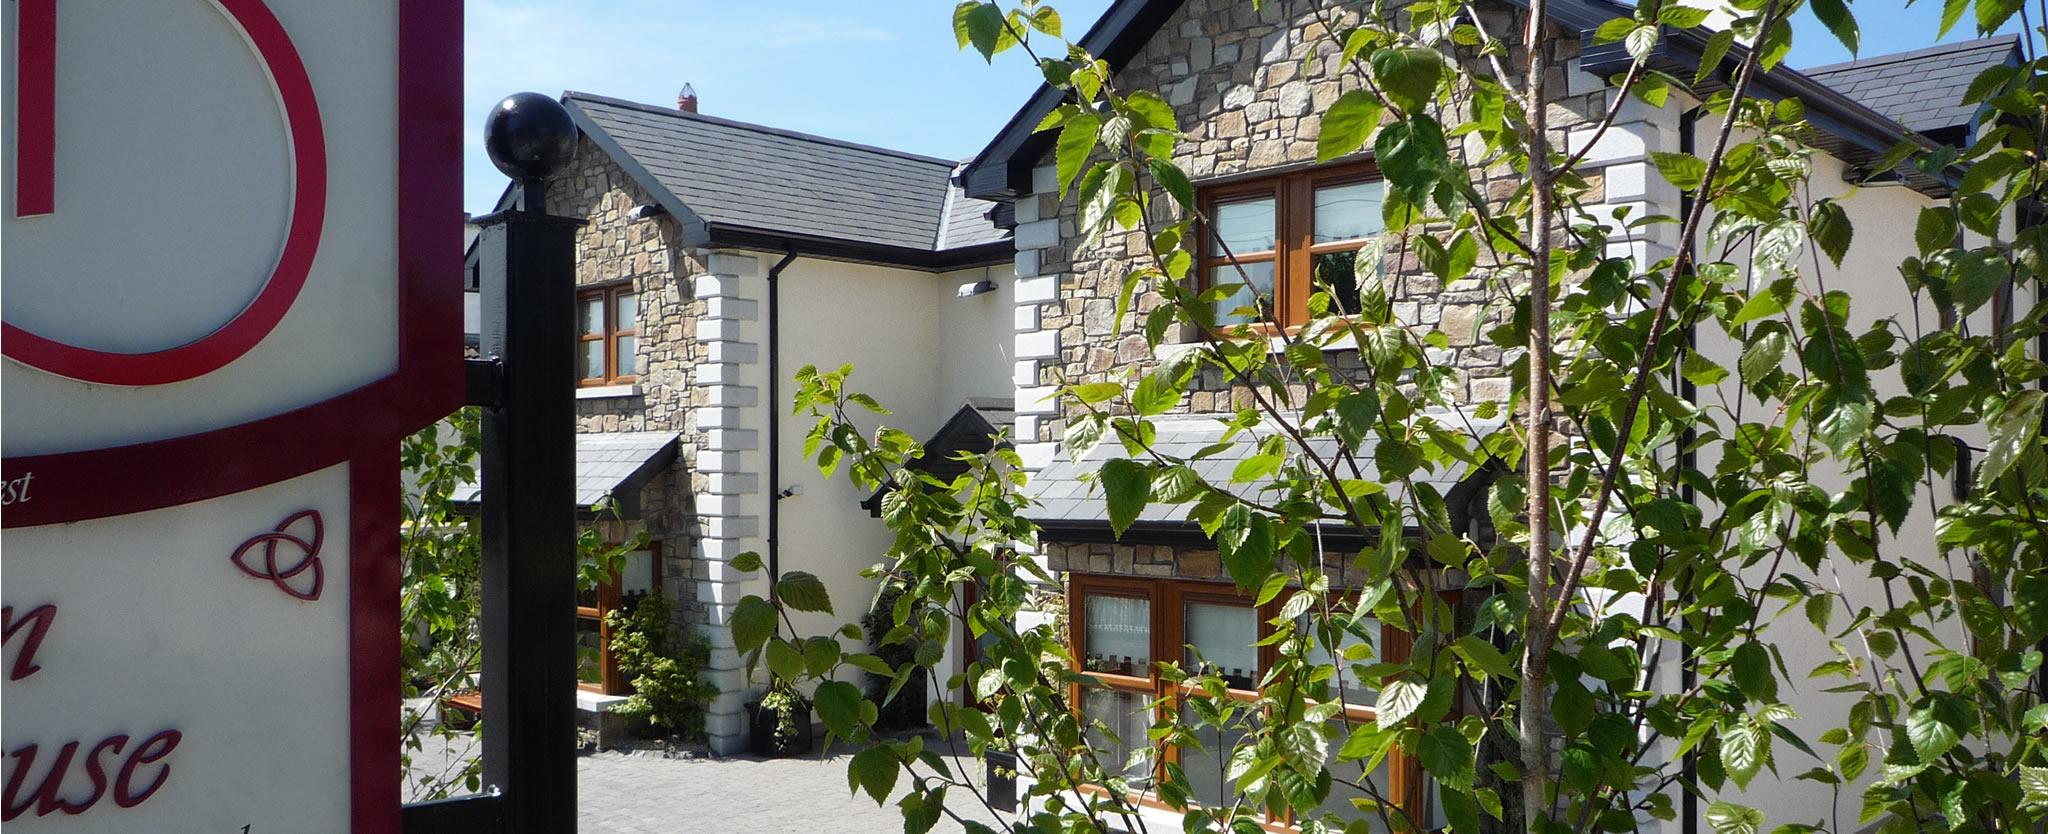 Carlow - DPD Ireland